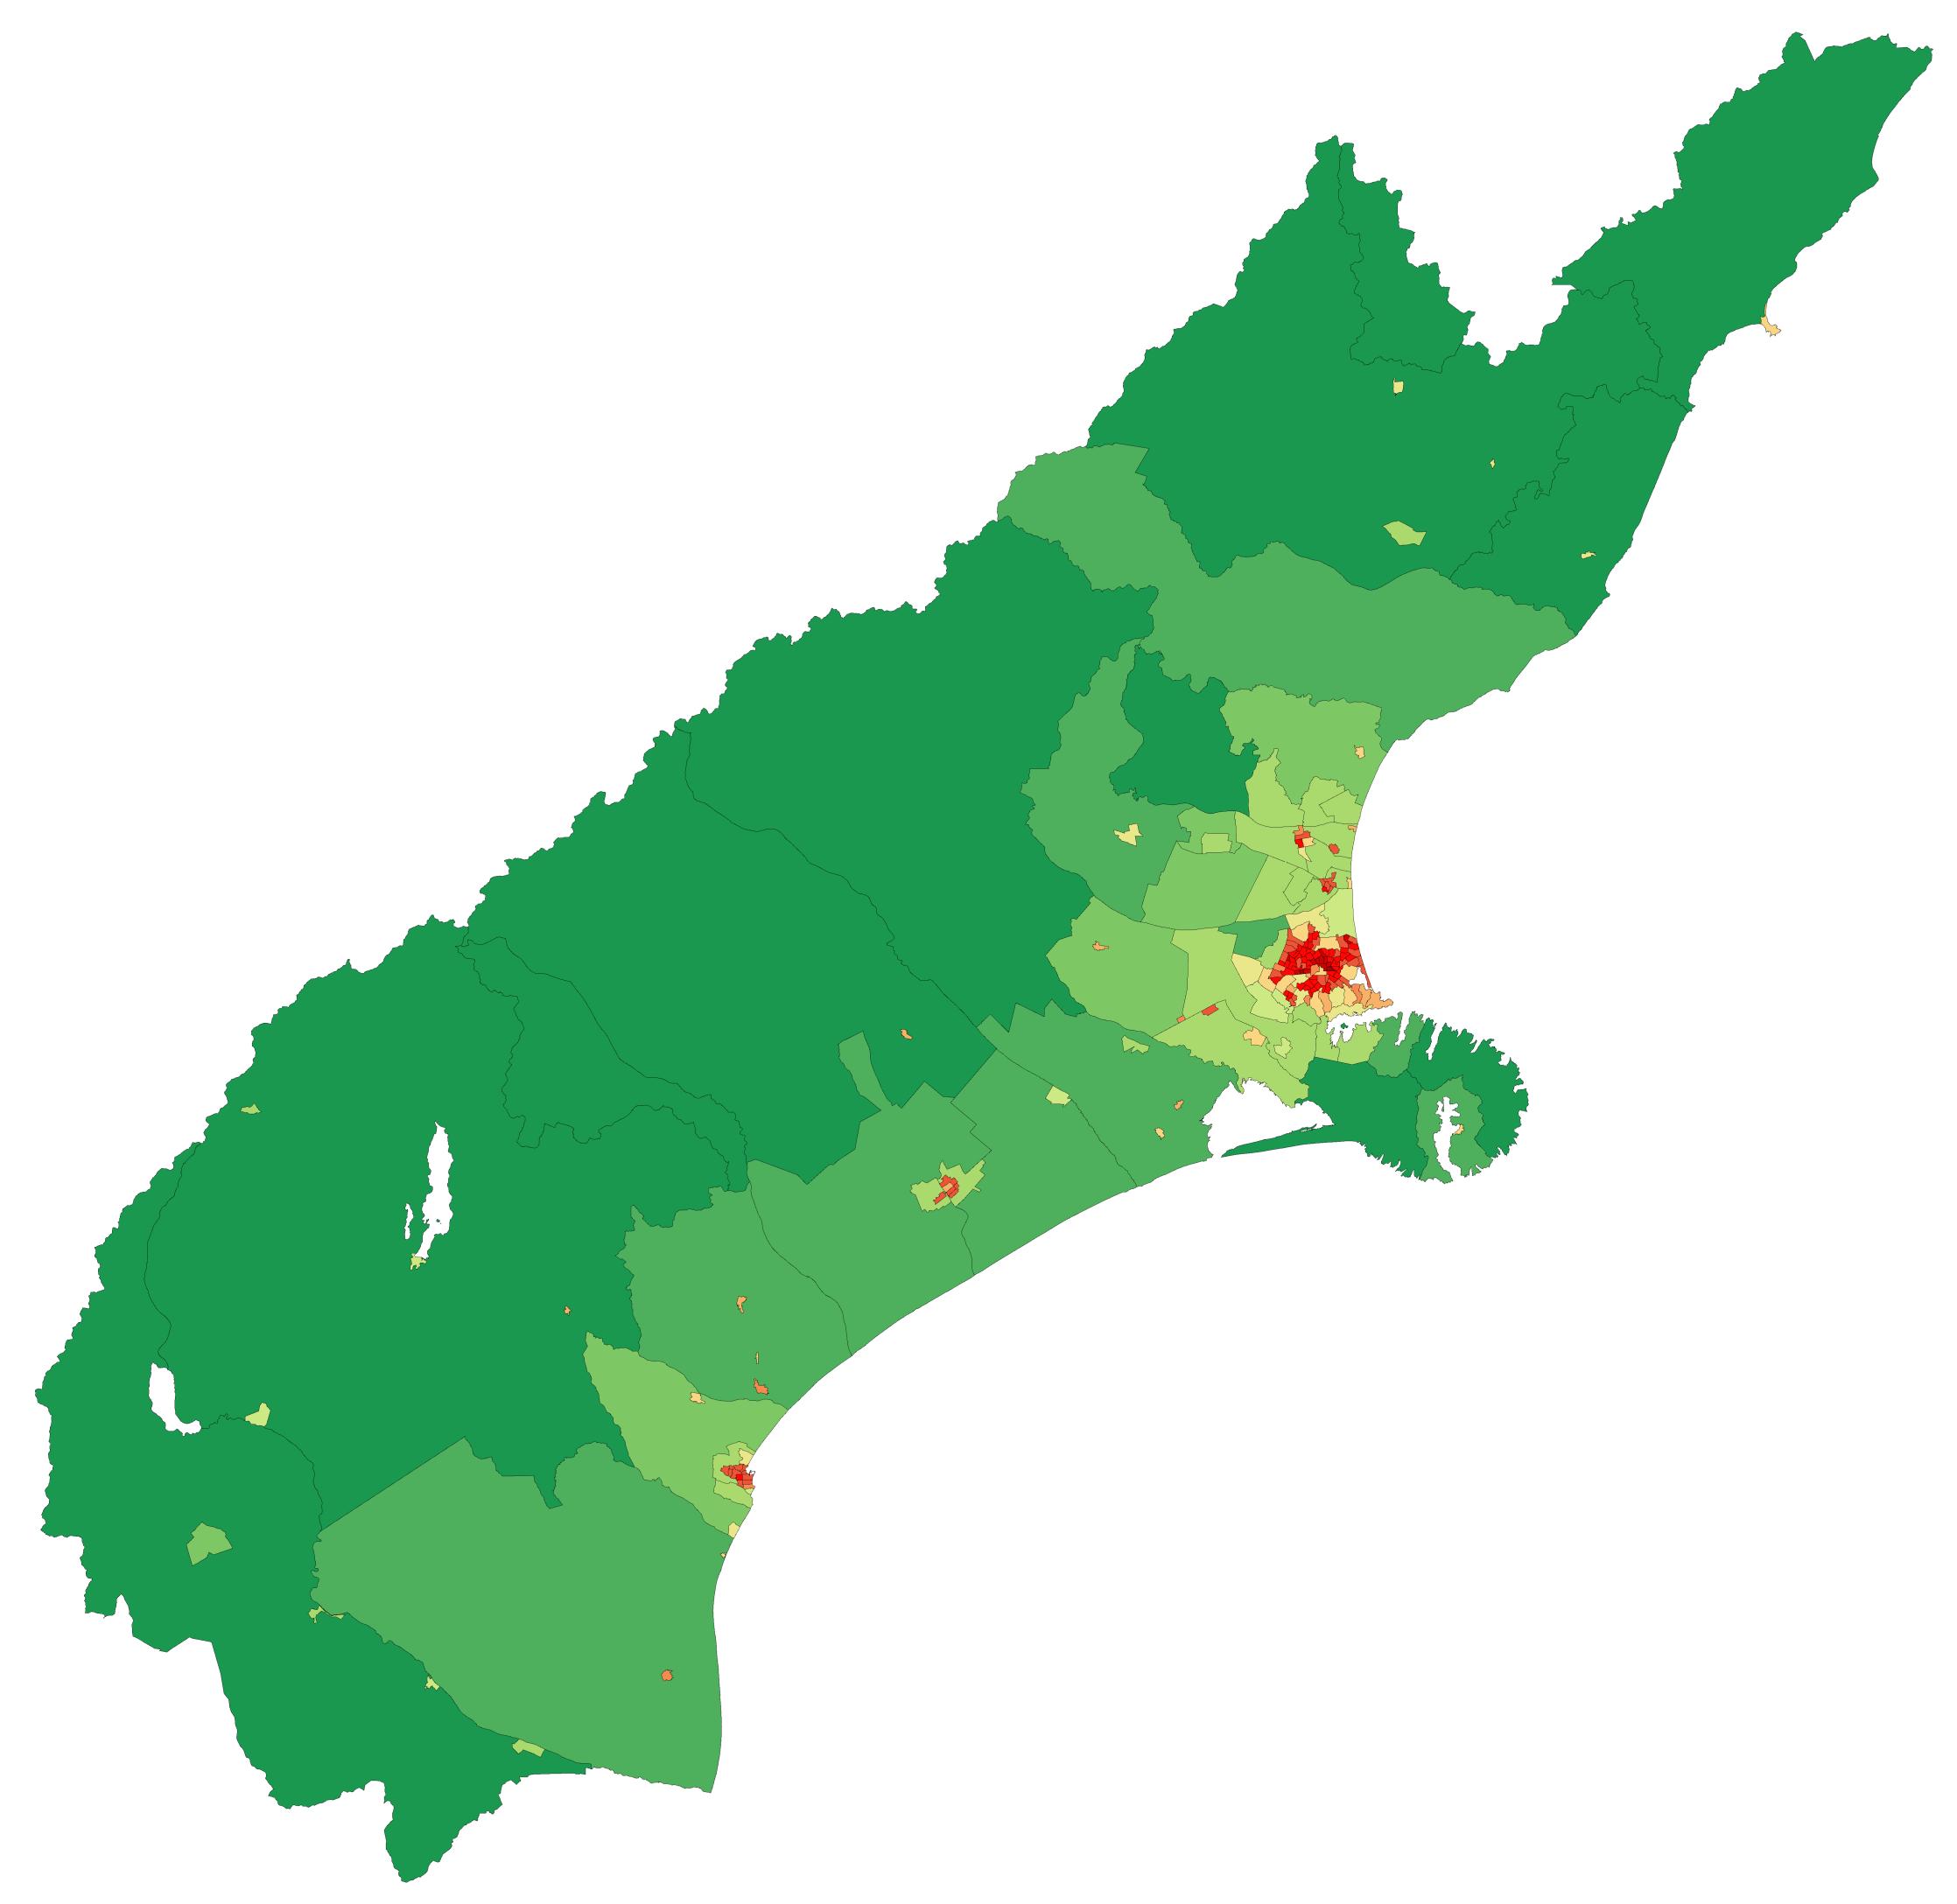 File:CanterburyRegionPopulationDensity.png - Wikimedia Commons